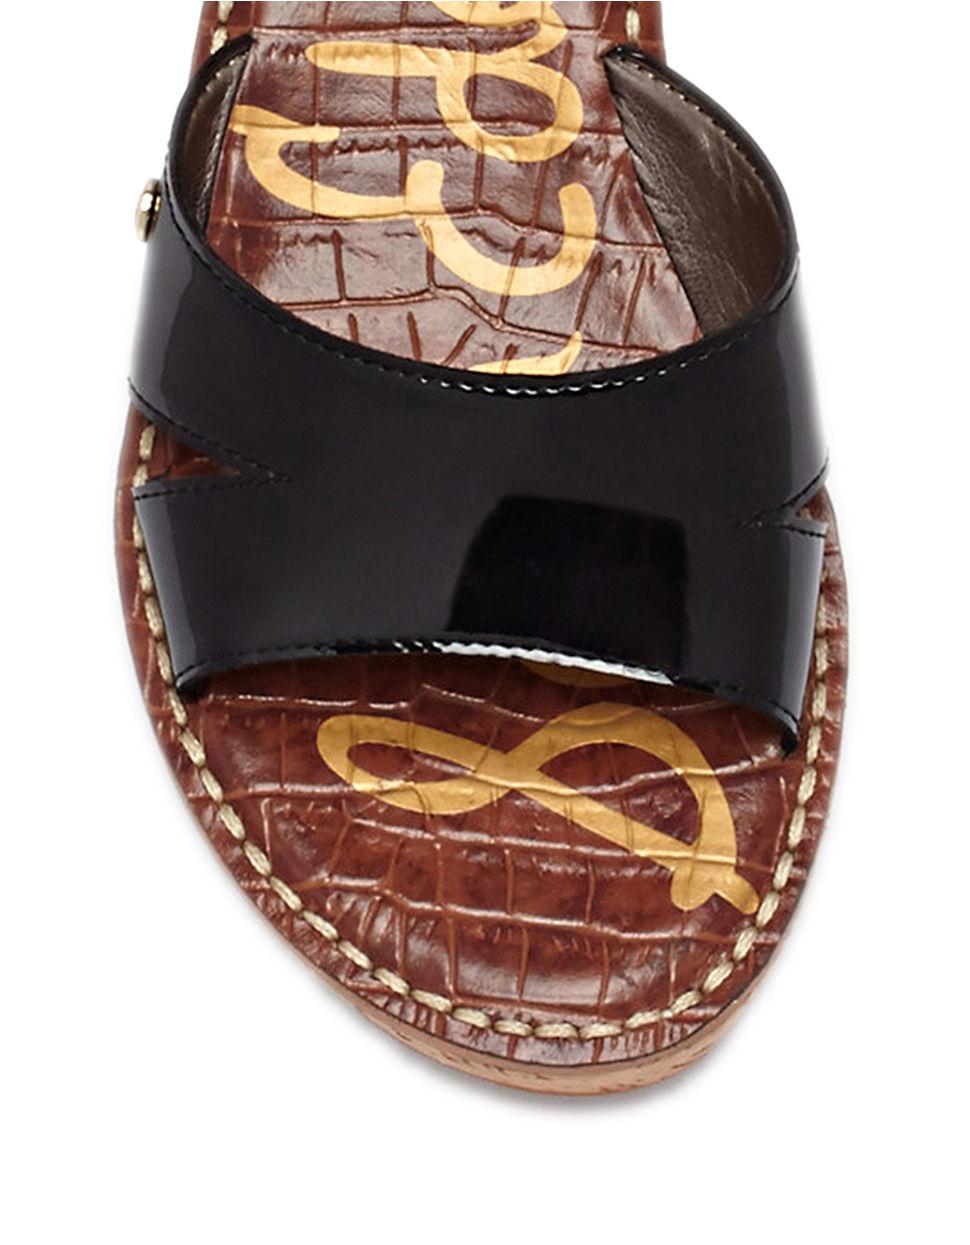 0ad6e60110ea Lyst - Sam Edelman Reid Patent Leather Wedge Sandals in Black